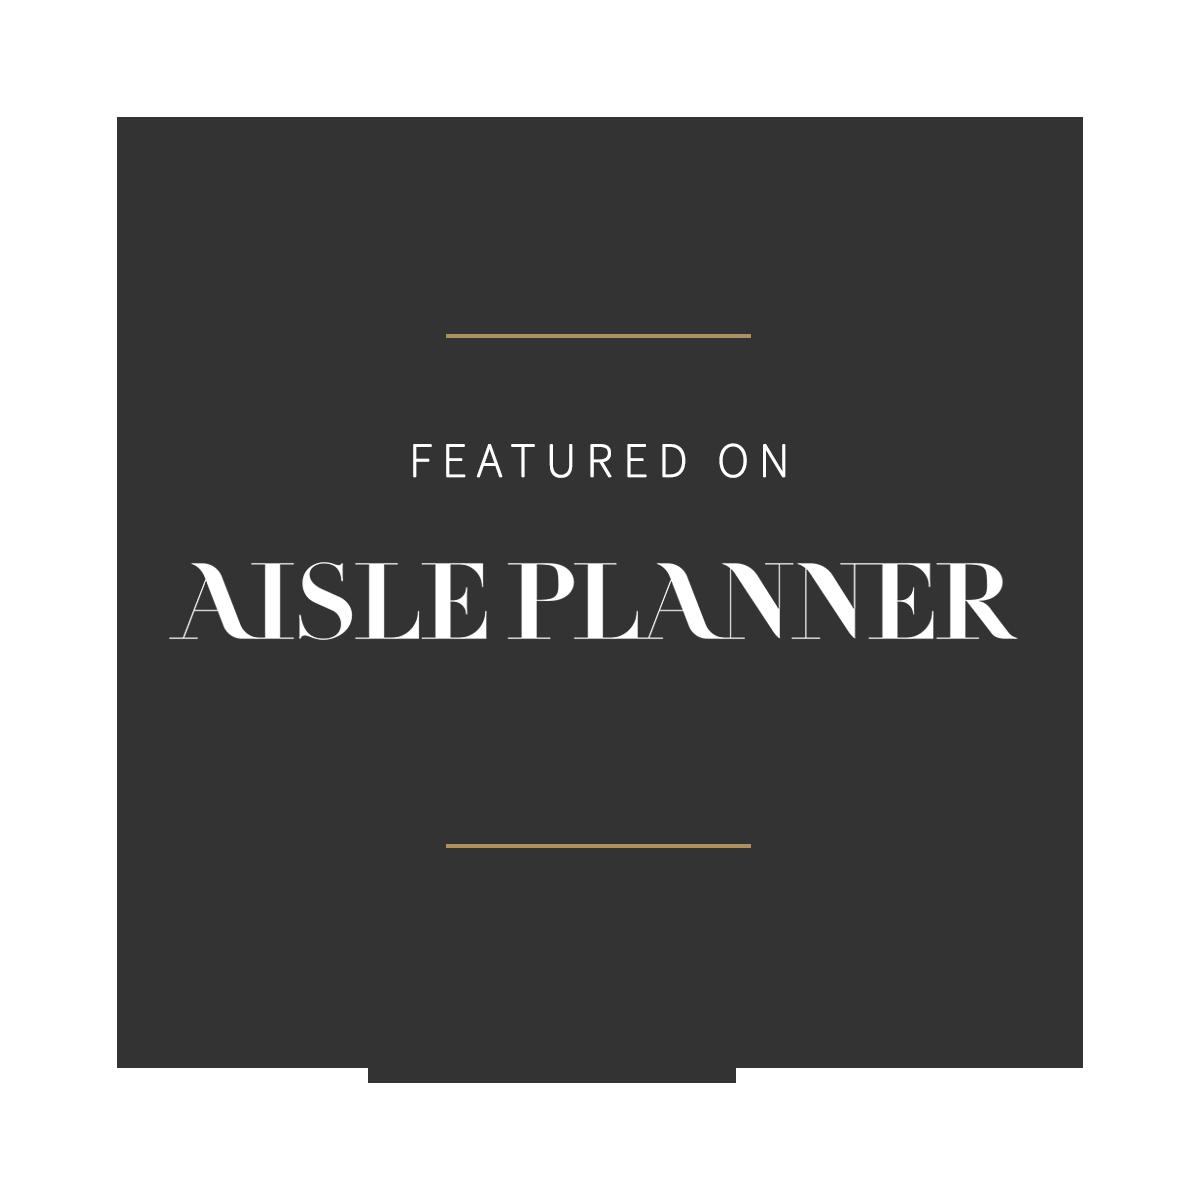 aisle planner